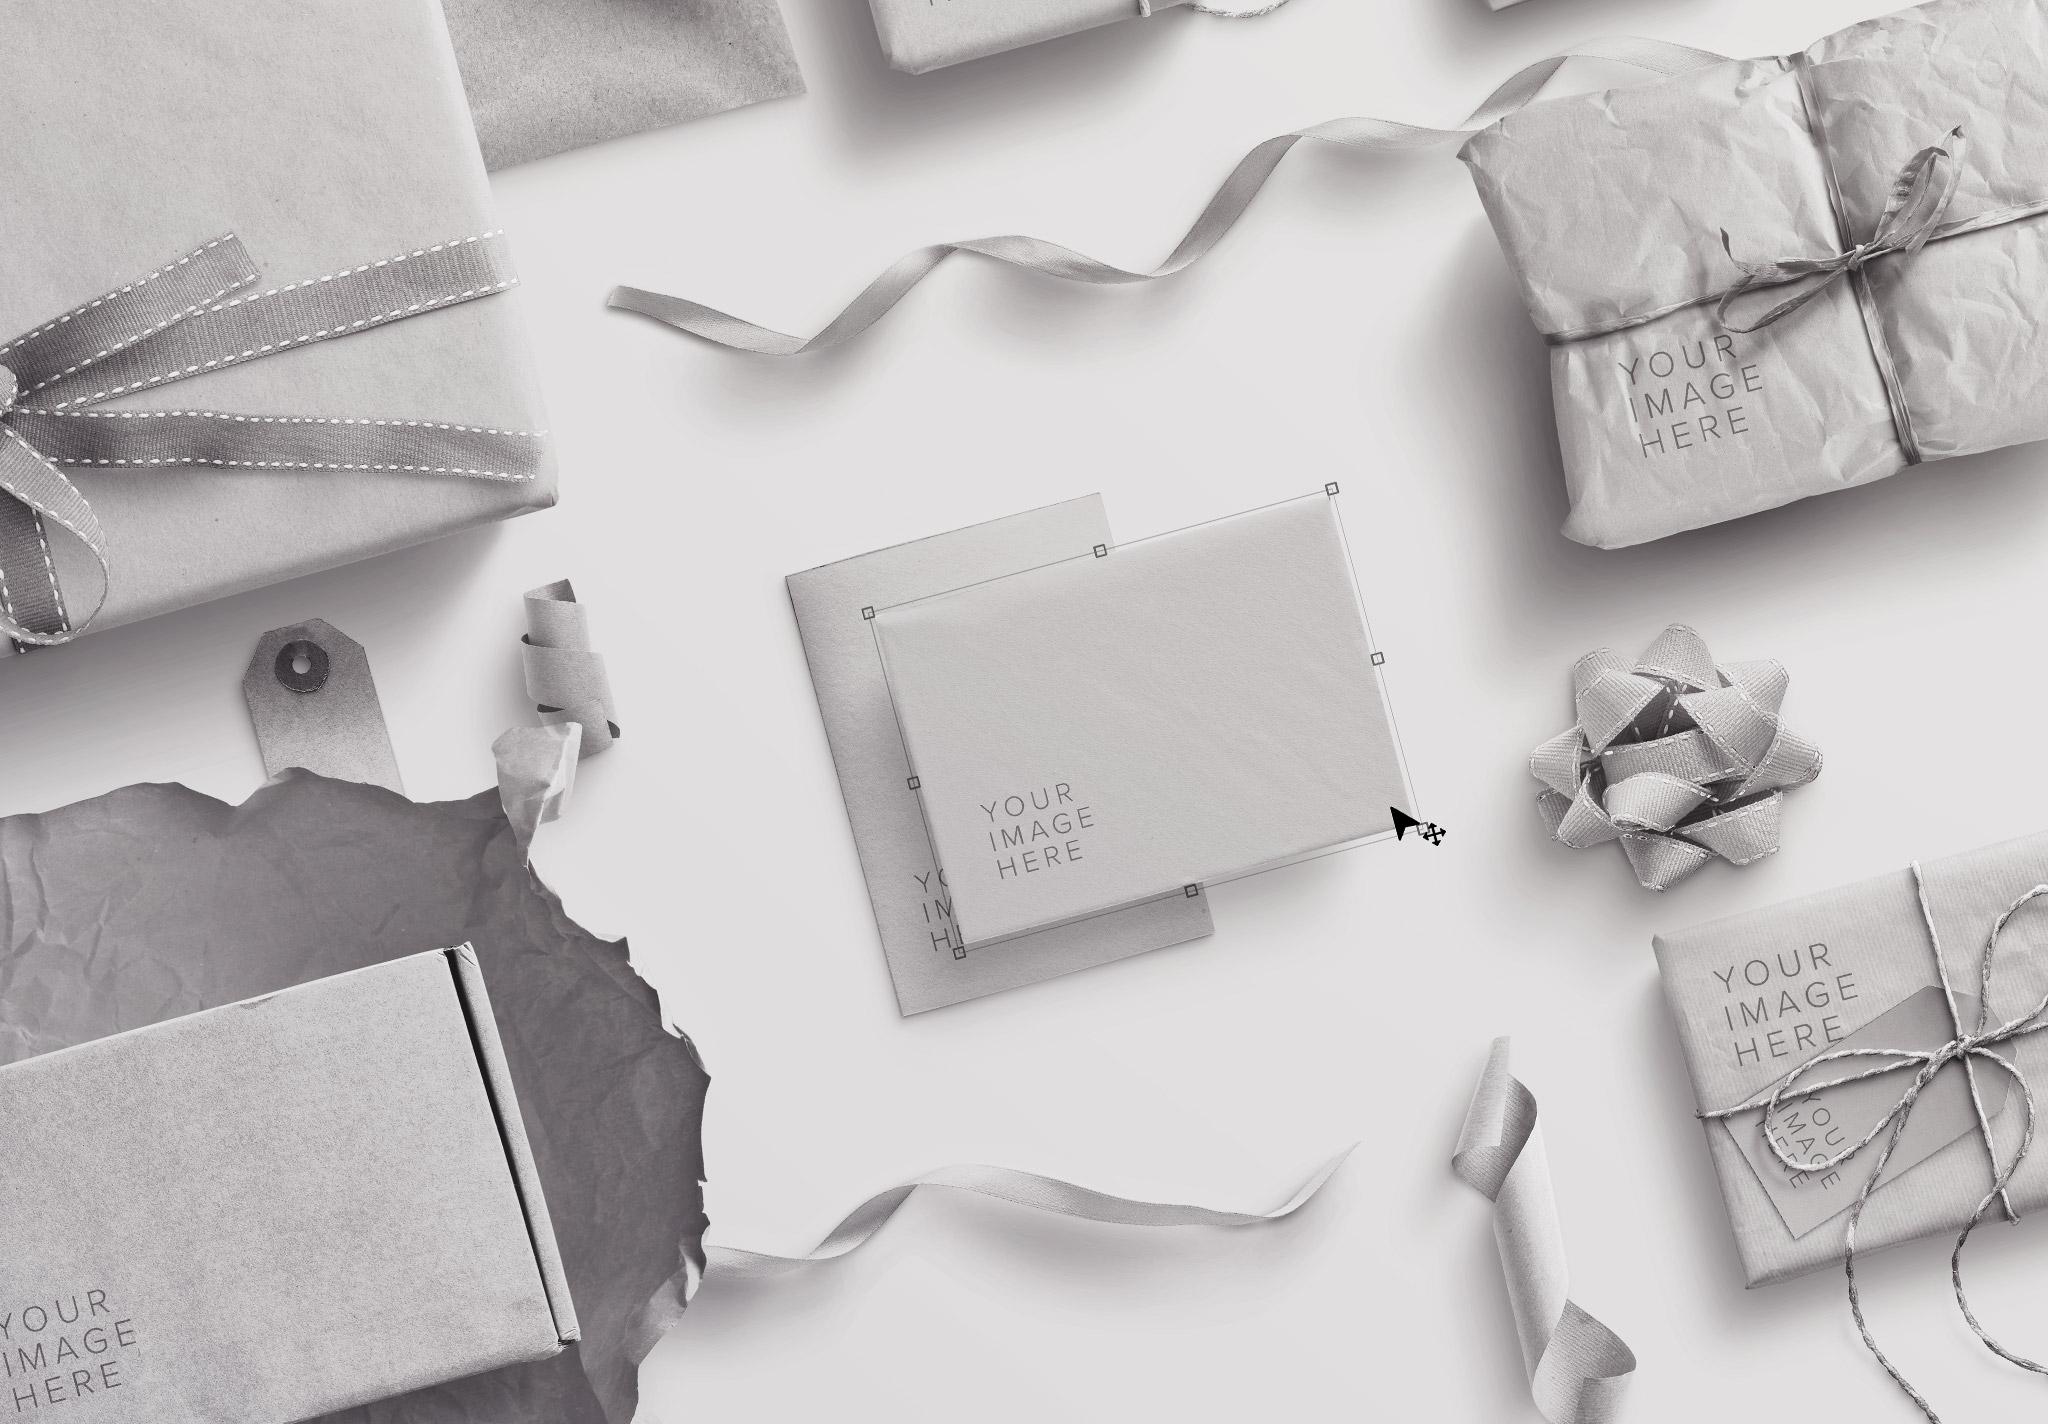 paper goods free scene generator image03